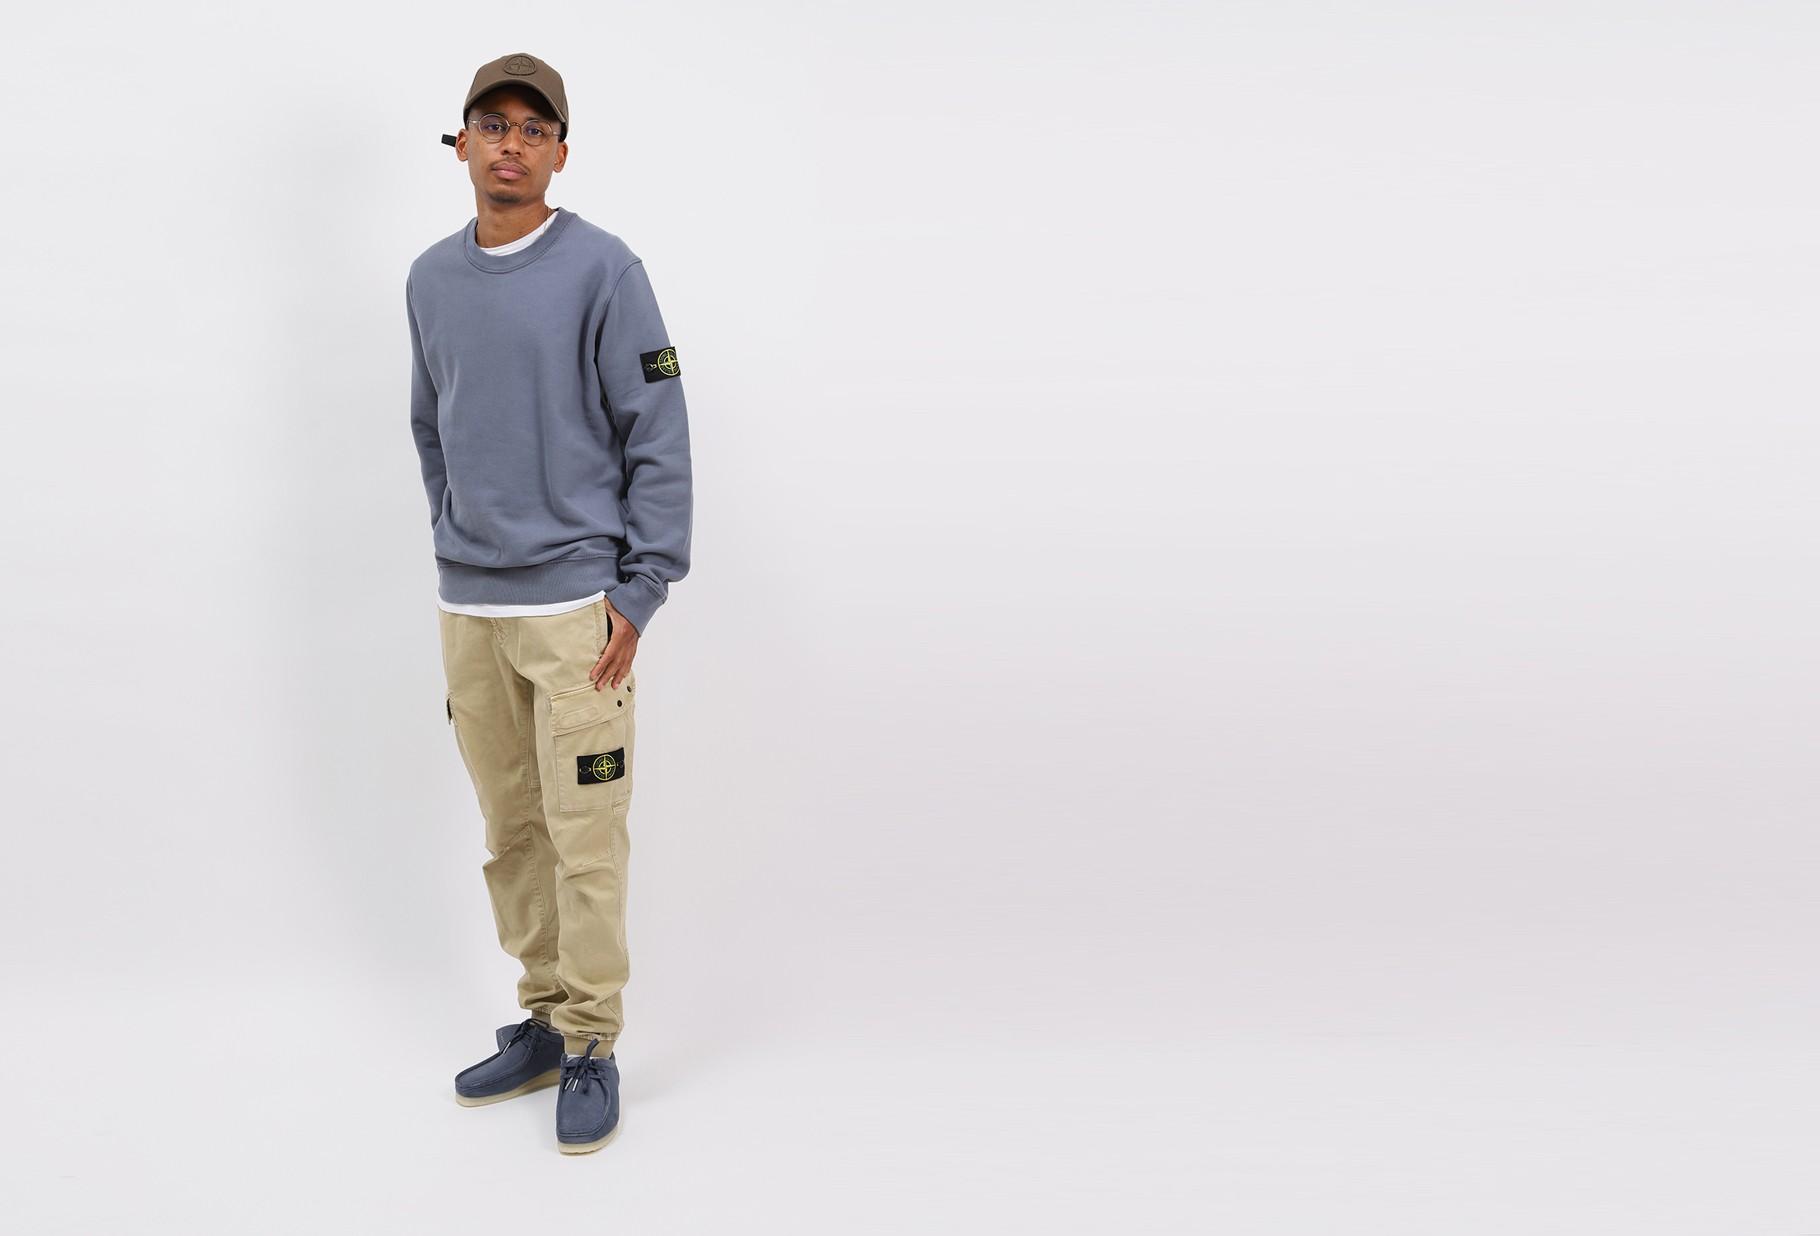 STONE ISLAND / 63020 crewneck sweater v0046 Carta zucchero